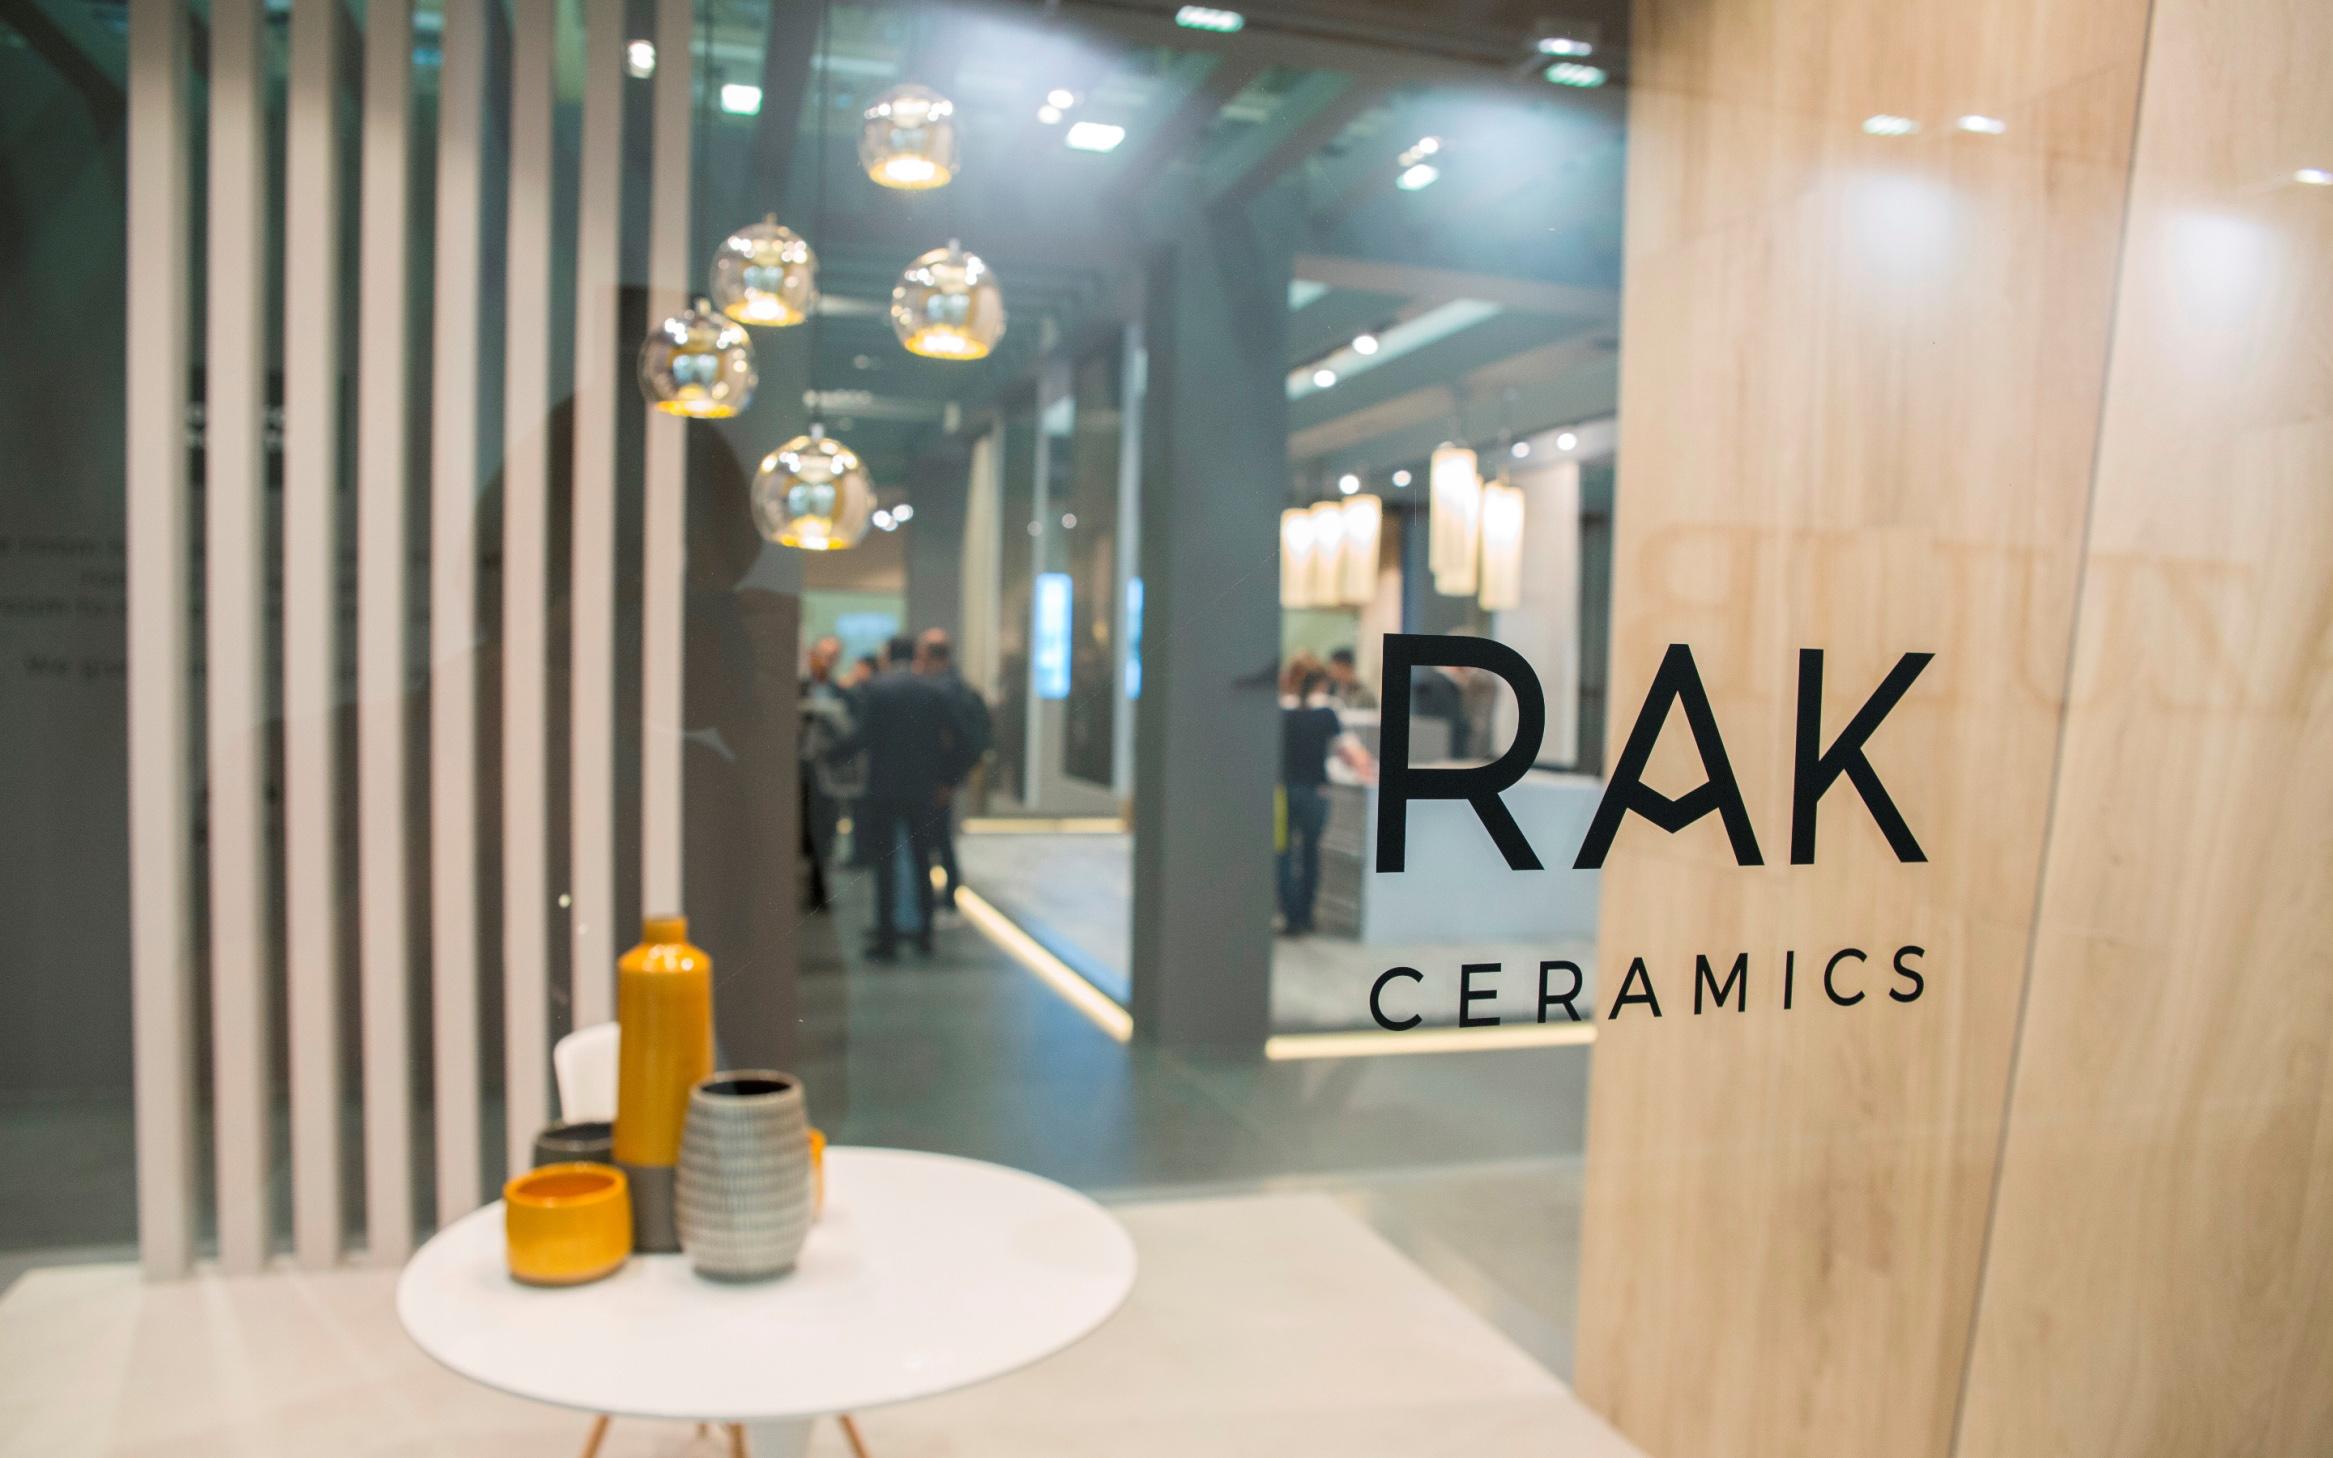 RAK Ceramics' H1 2019 financial results show rise in gross profit margins